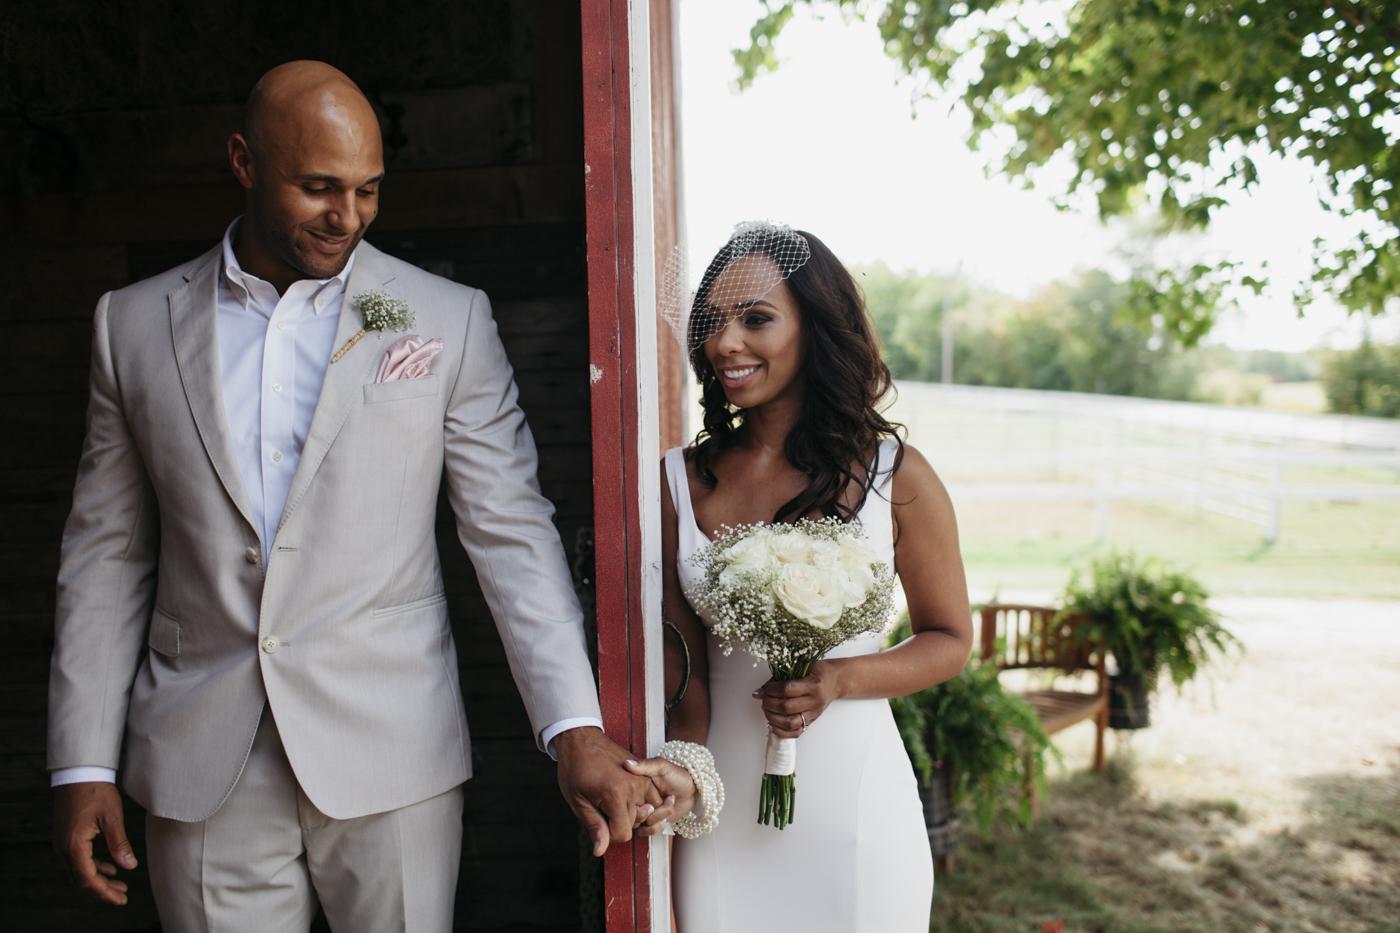 Toni_Earl_Rest_and_Be_Thankful_farm_wedding_maine_007.jpg